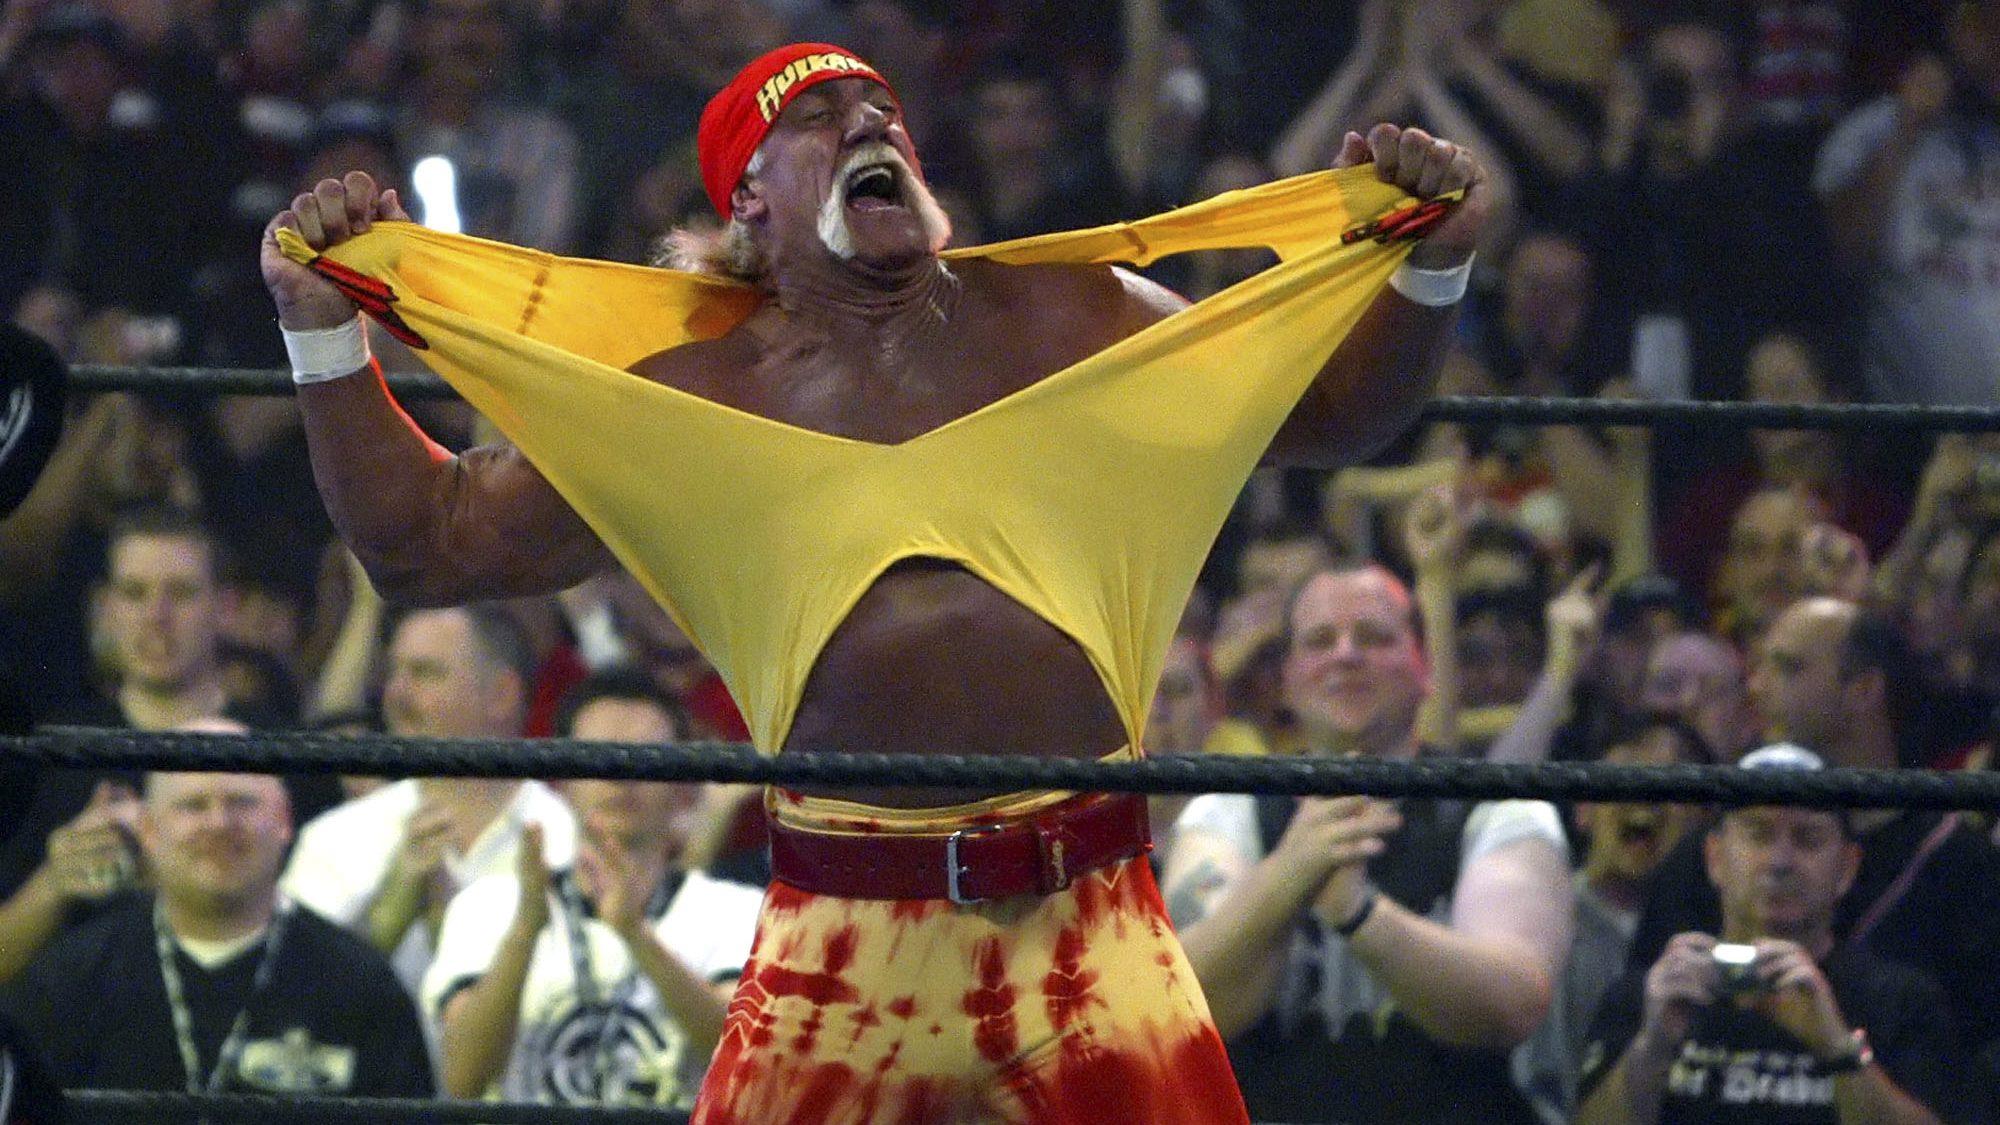 Is it too soon for Hulk Hogan to return to WWE?